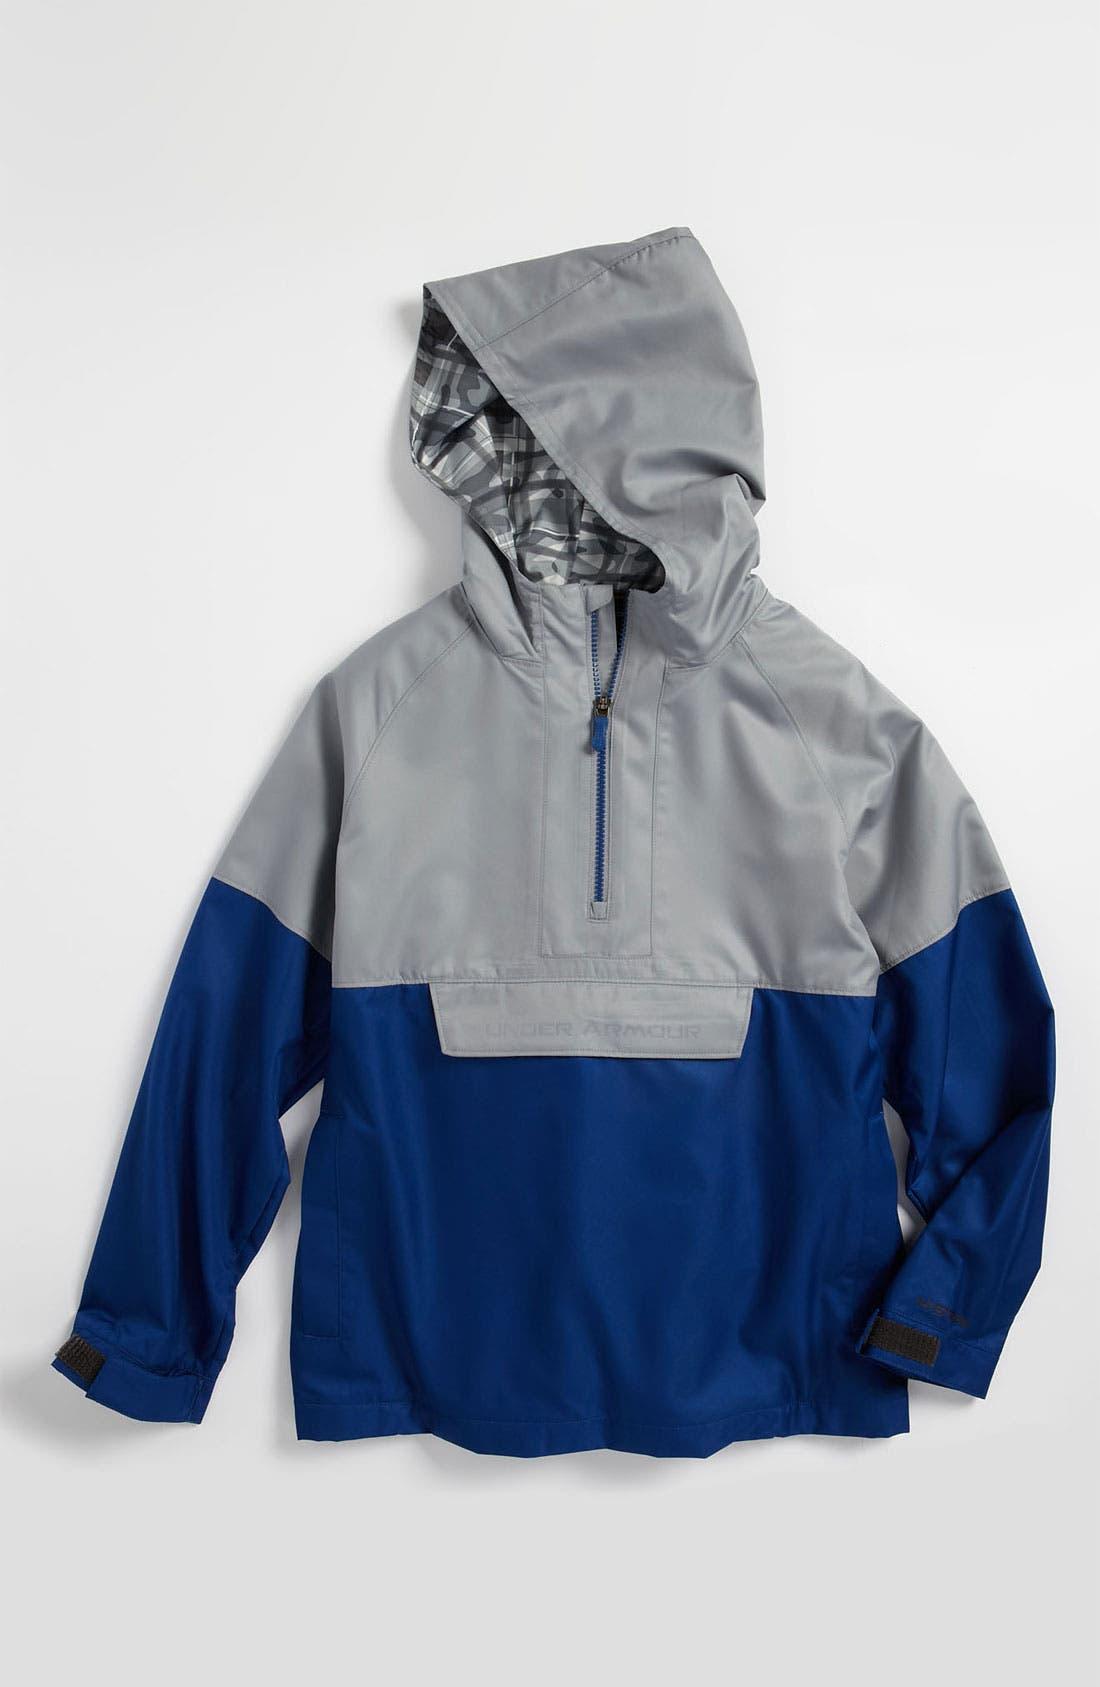 Alternate Image 1 Selected - Under Armour 'Anorak' Jacket (Big Boys)